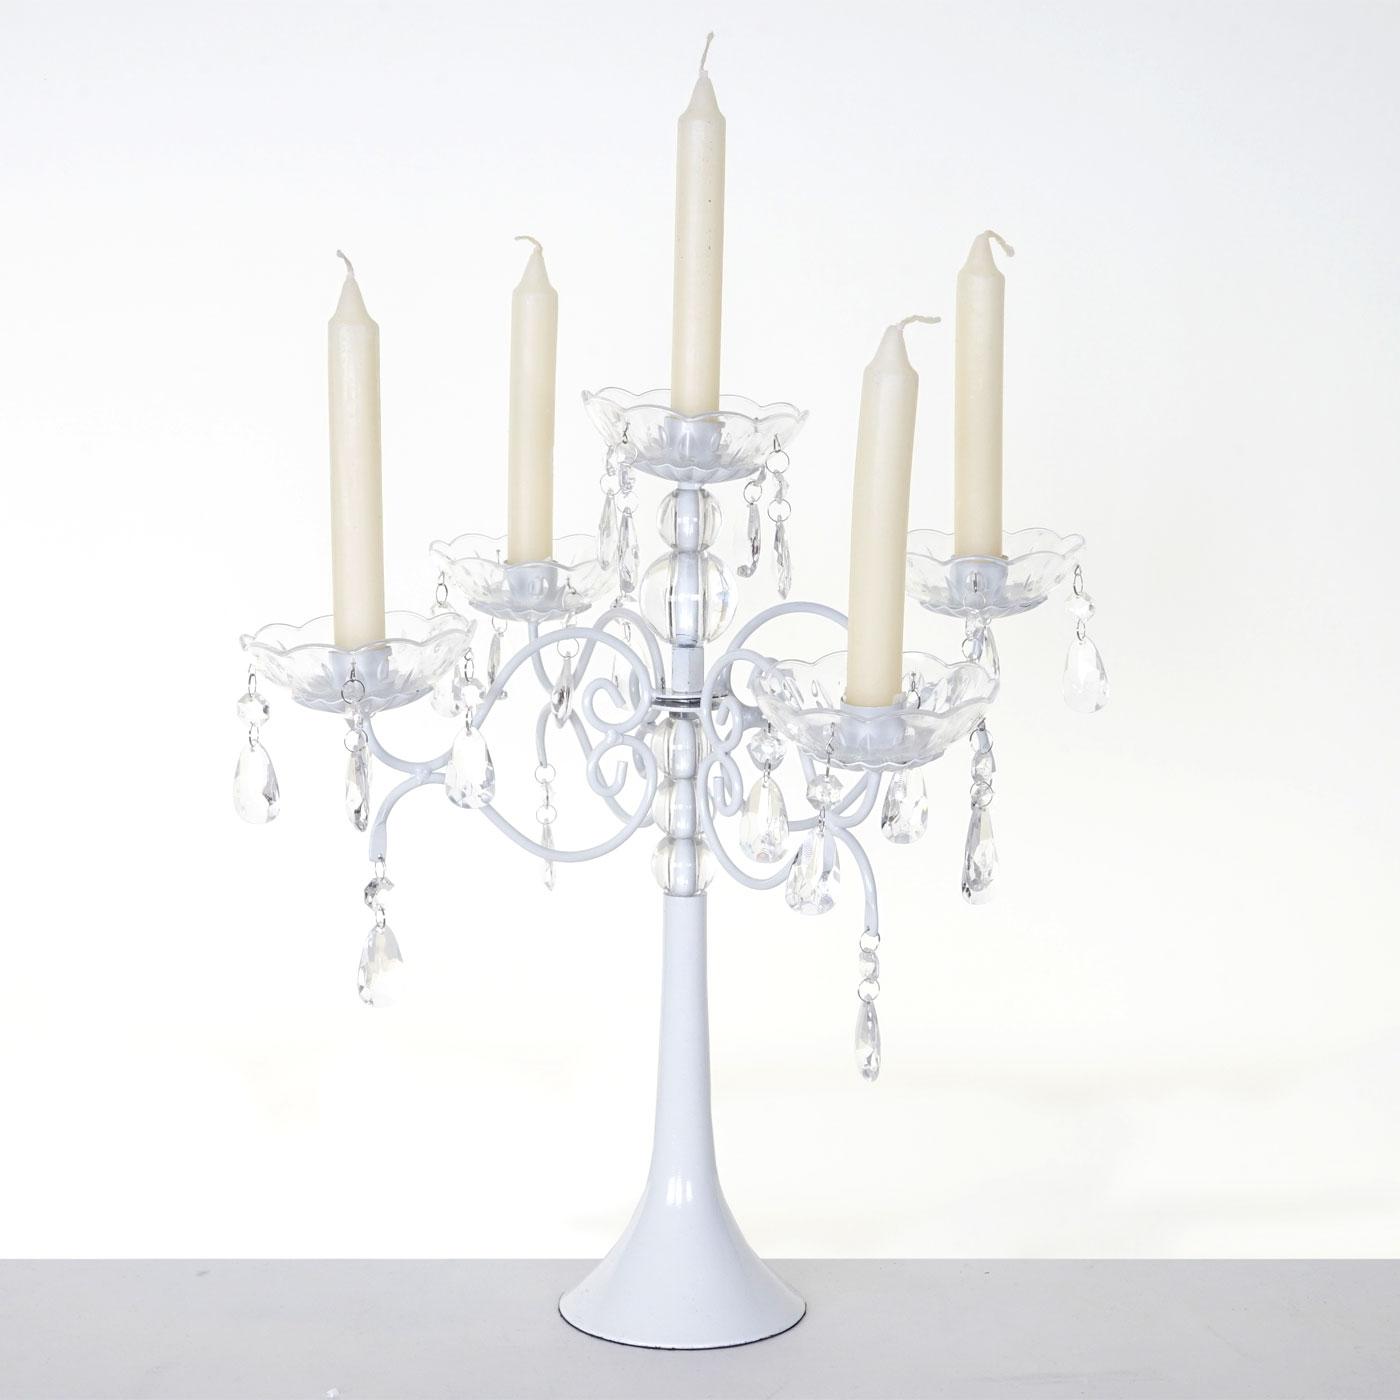 kerzenst nder acryl kerzenleuchter kerzenhalter kristall 41x40x40cm wei ebay. Black Bedroom Furniture Sets. Home Design Ideas